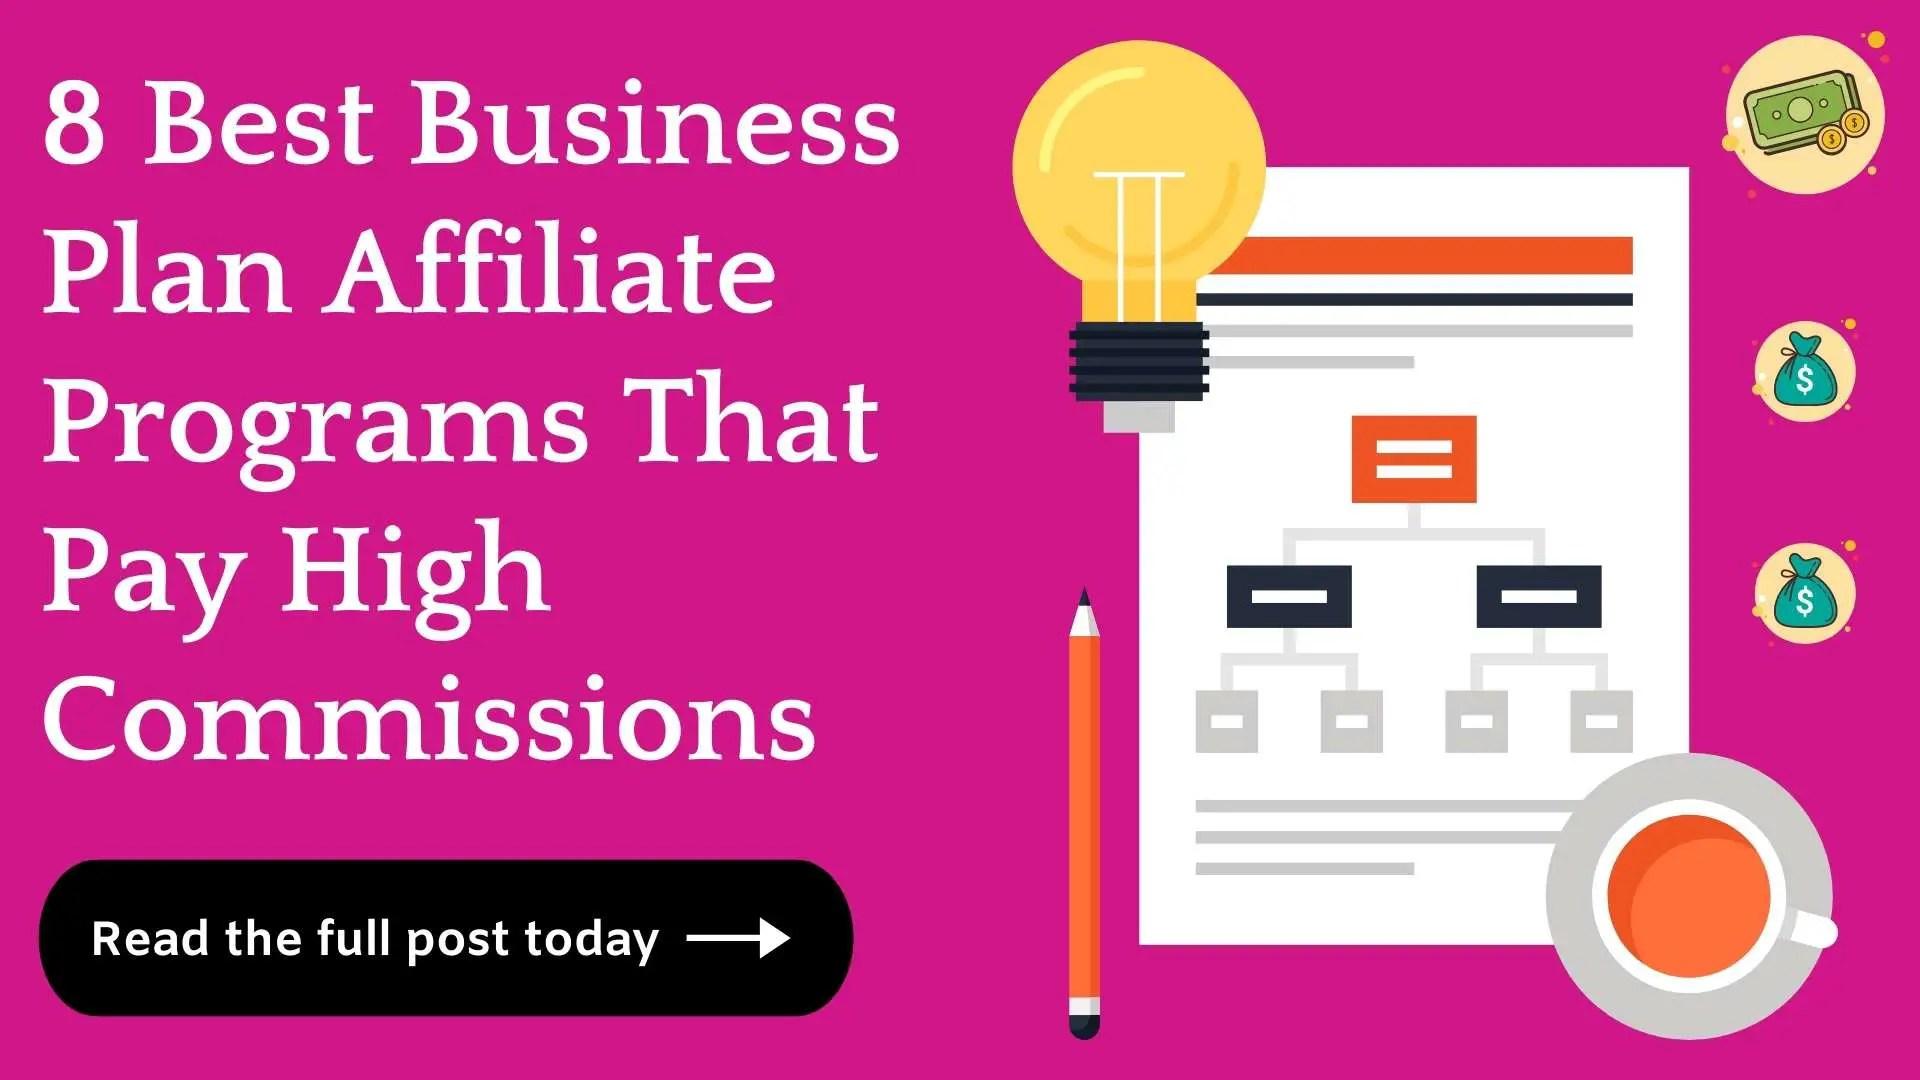 Best Business Plan Affiliate Programs